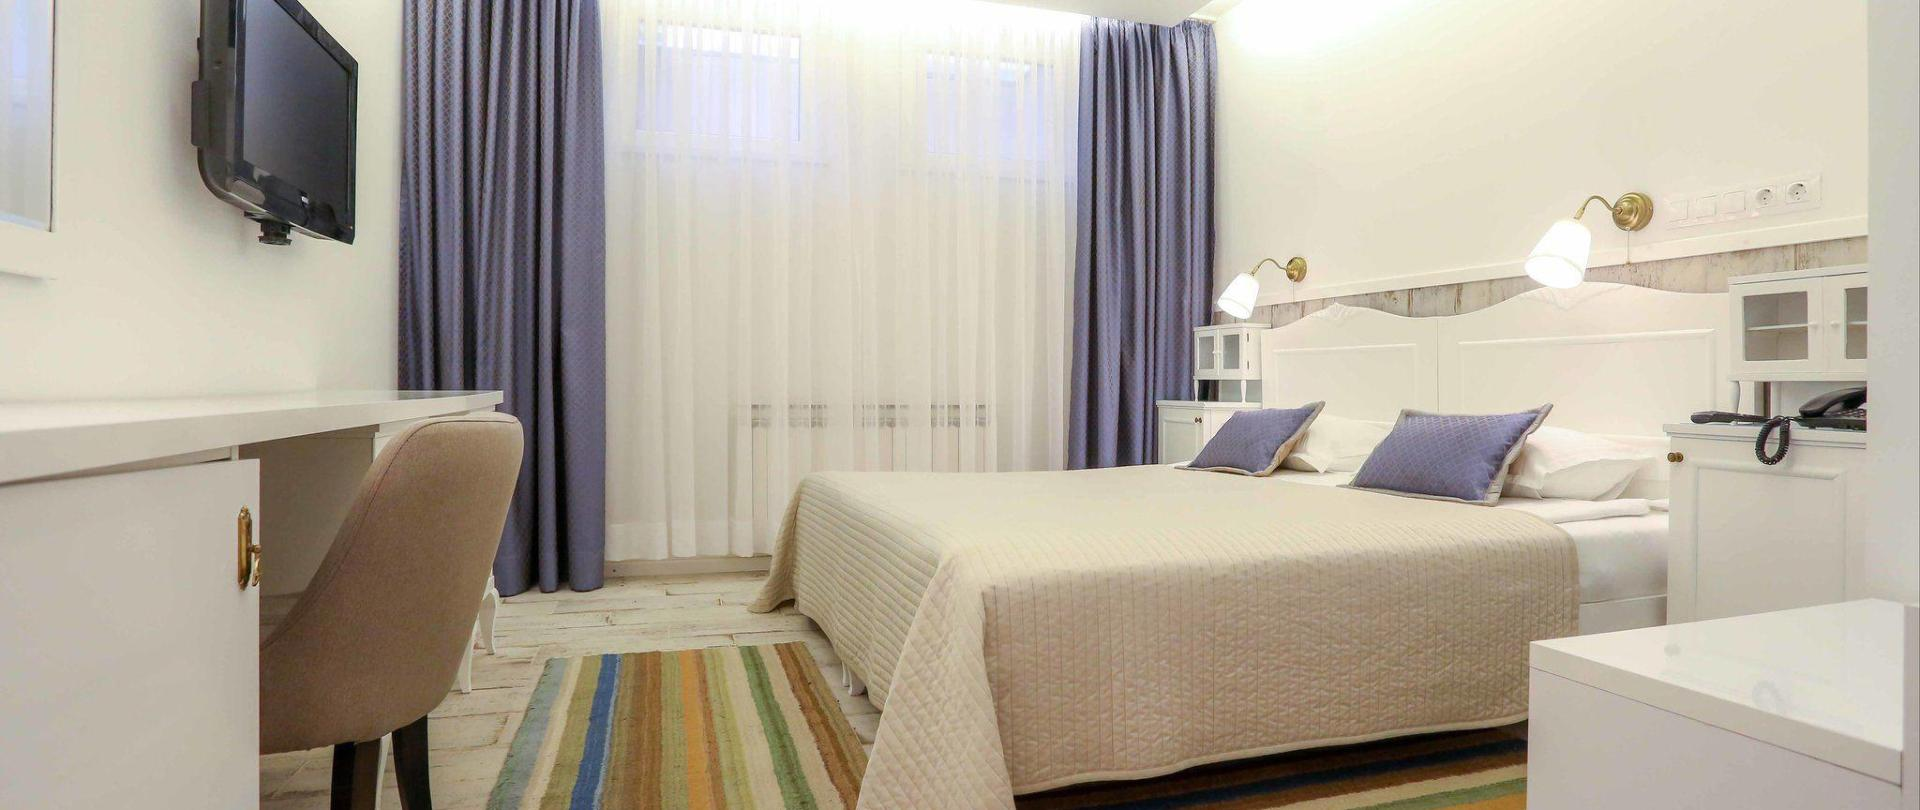 hotel-divan-by-dzenat-drekovic-29-08-2016-17.jpg